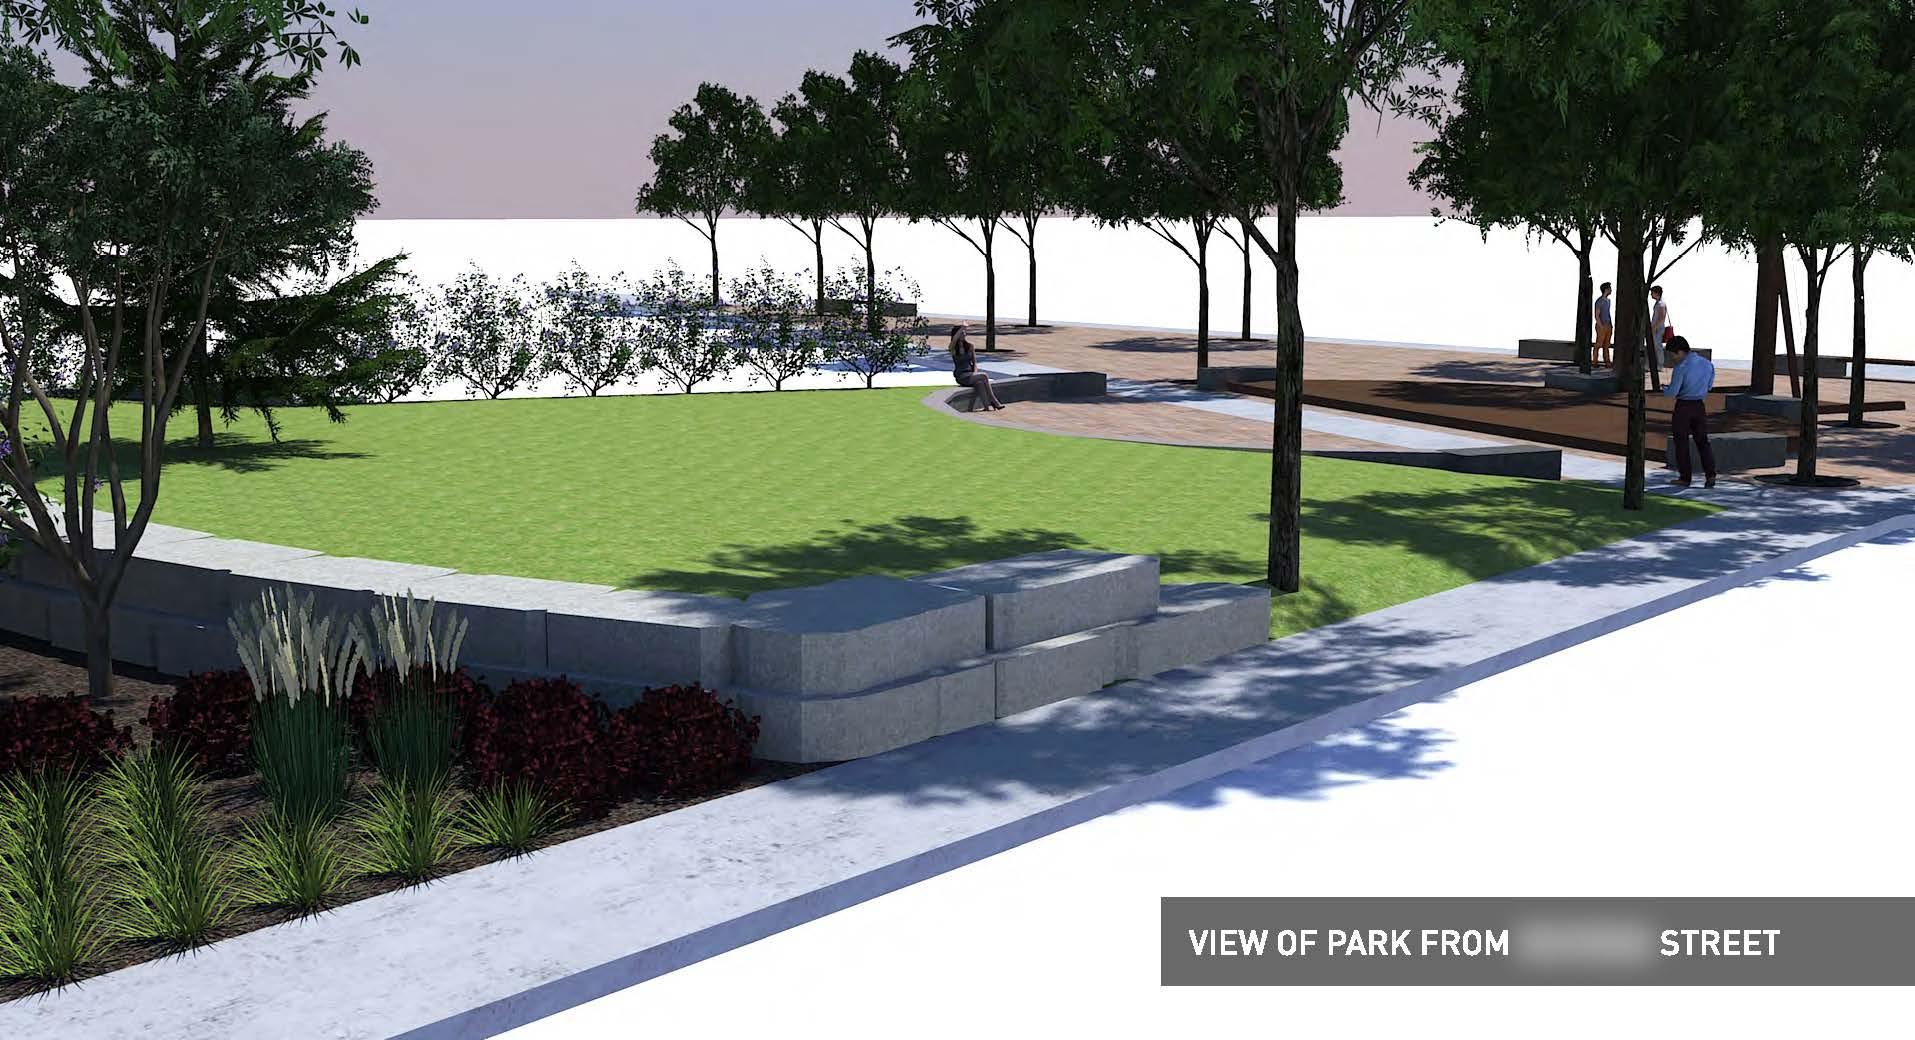 Garden View_Community Park Concept_Riverview Design Solutions_Architecual Design.jpg